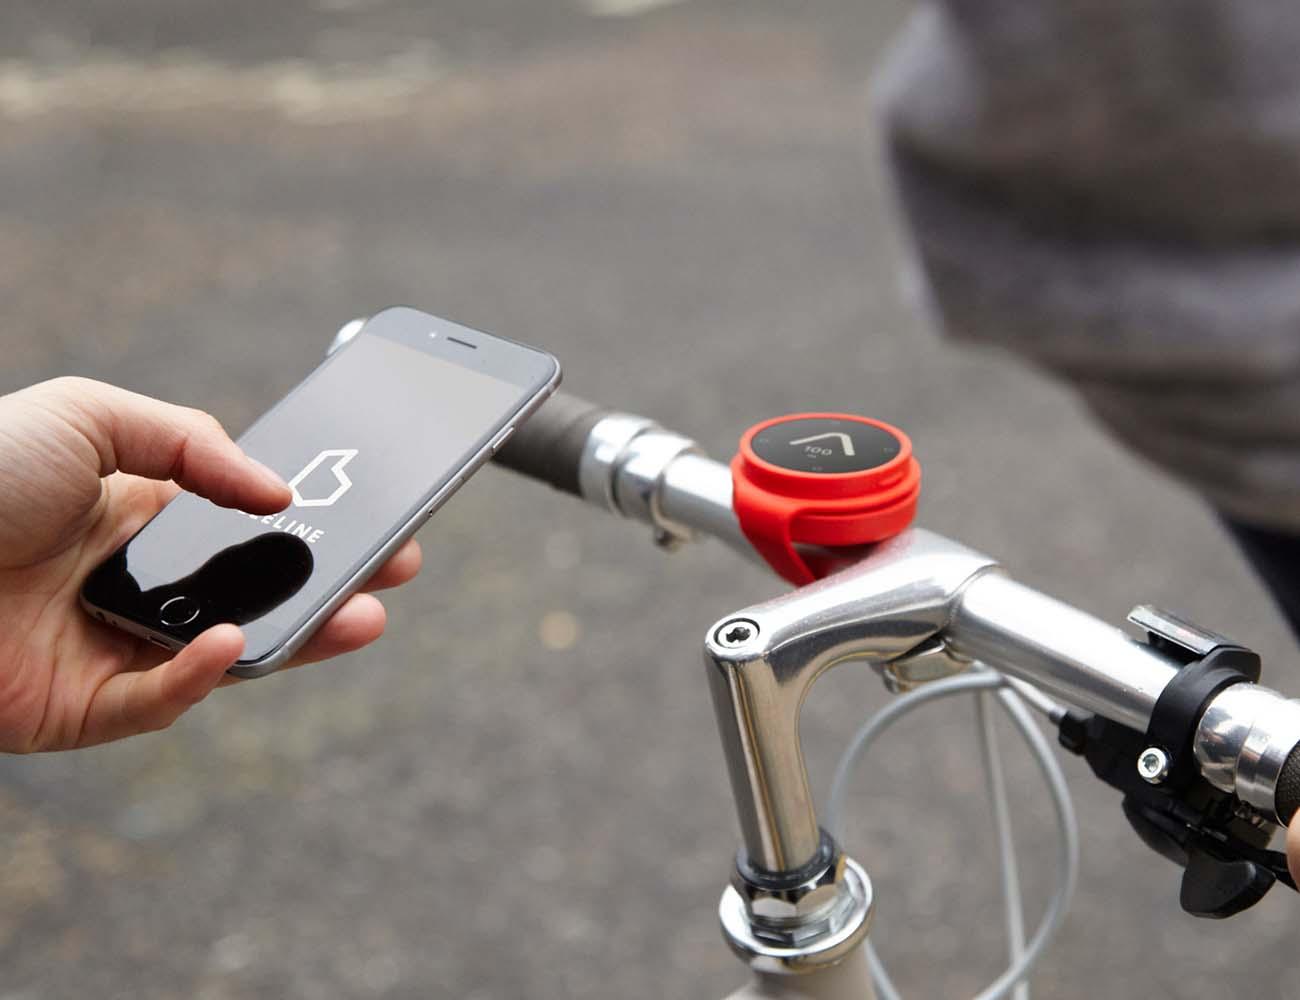 BeeLine – Smart and Simple Bike Navigation